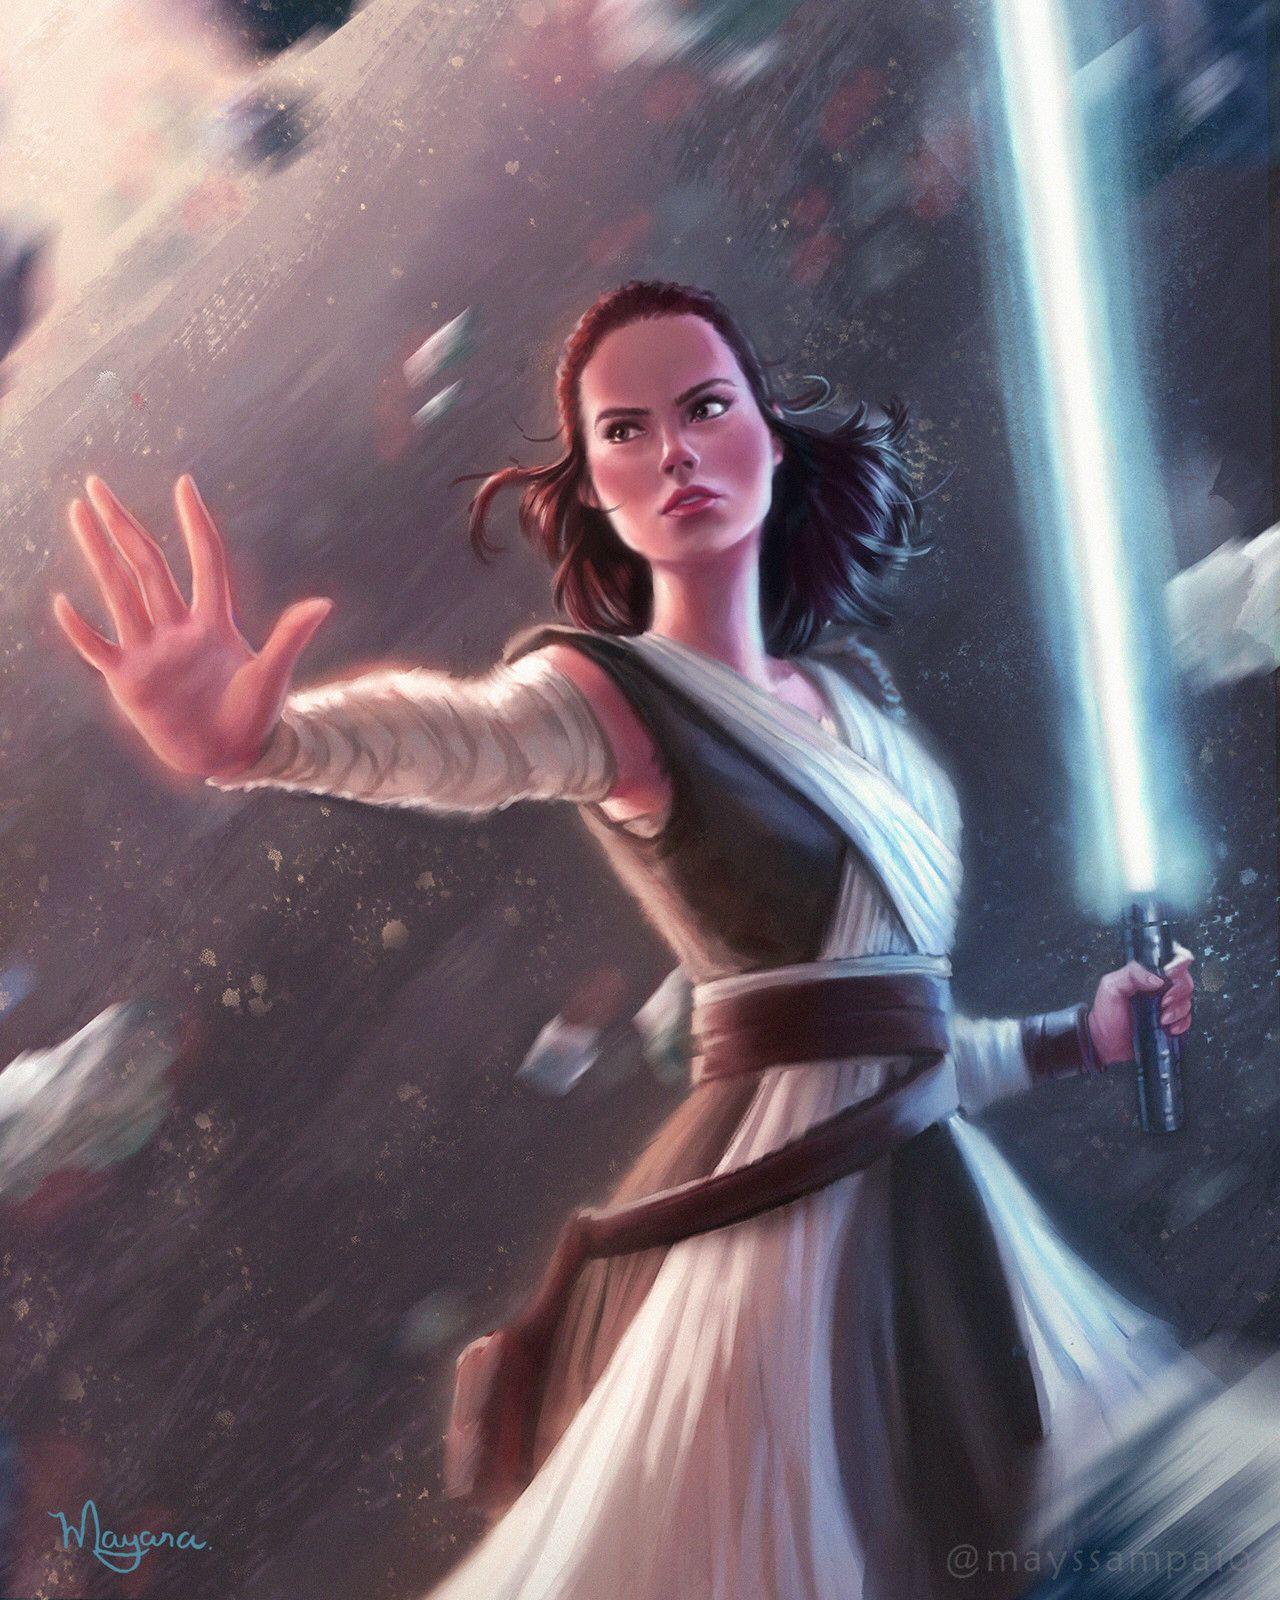 Rey Star Wars Starwars Starwarsart Starwarsfanart Rey Jedi Rey Star Wars Star Wars Fandom Star Wars Characters